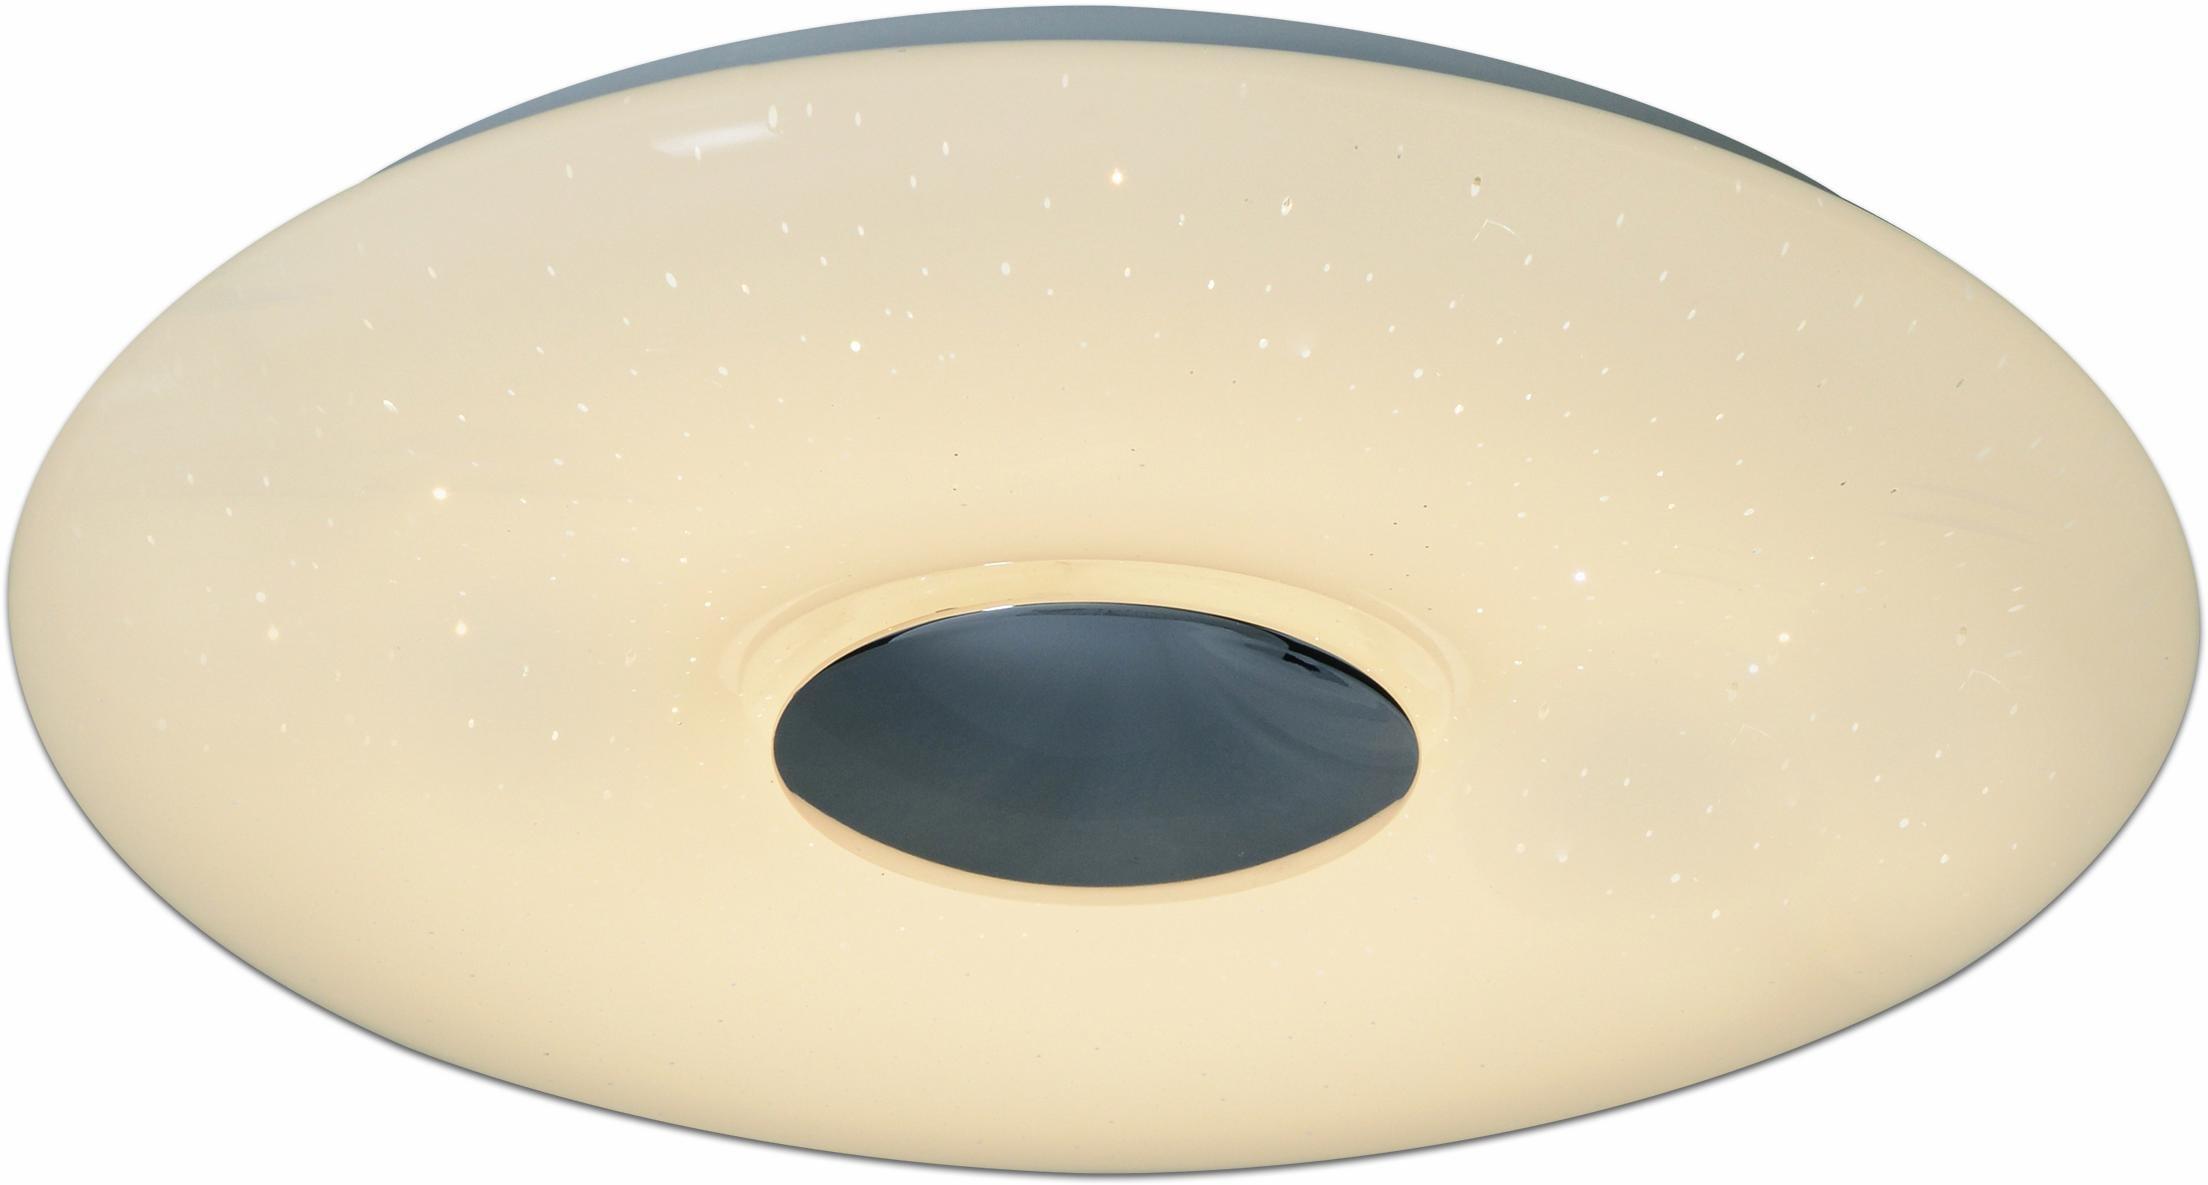 näve LED Deckenleuchte VERONA, LED-Board, Kaltweiß-Warmweiß, LED Deckenlampe